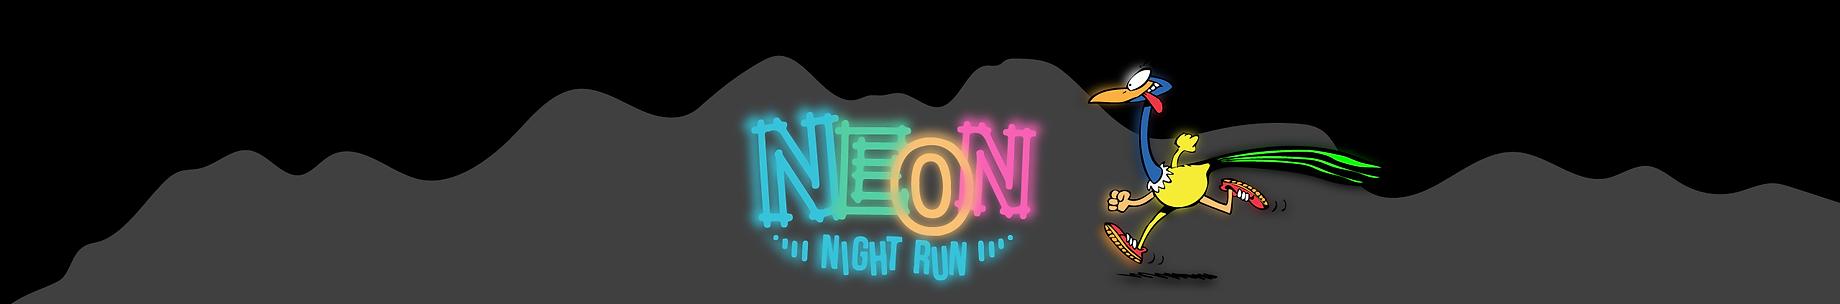 HEADER LPD-neon-night-run.png